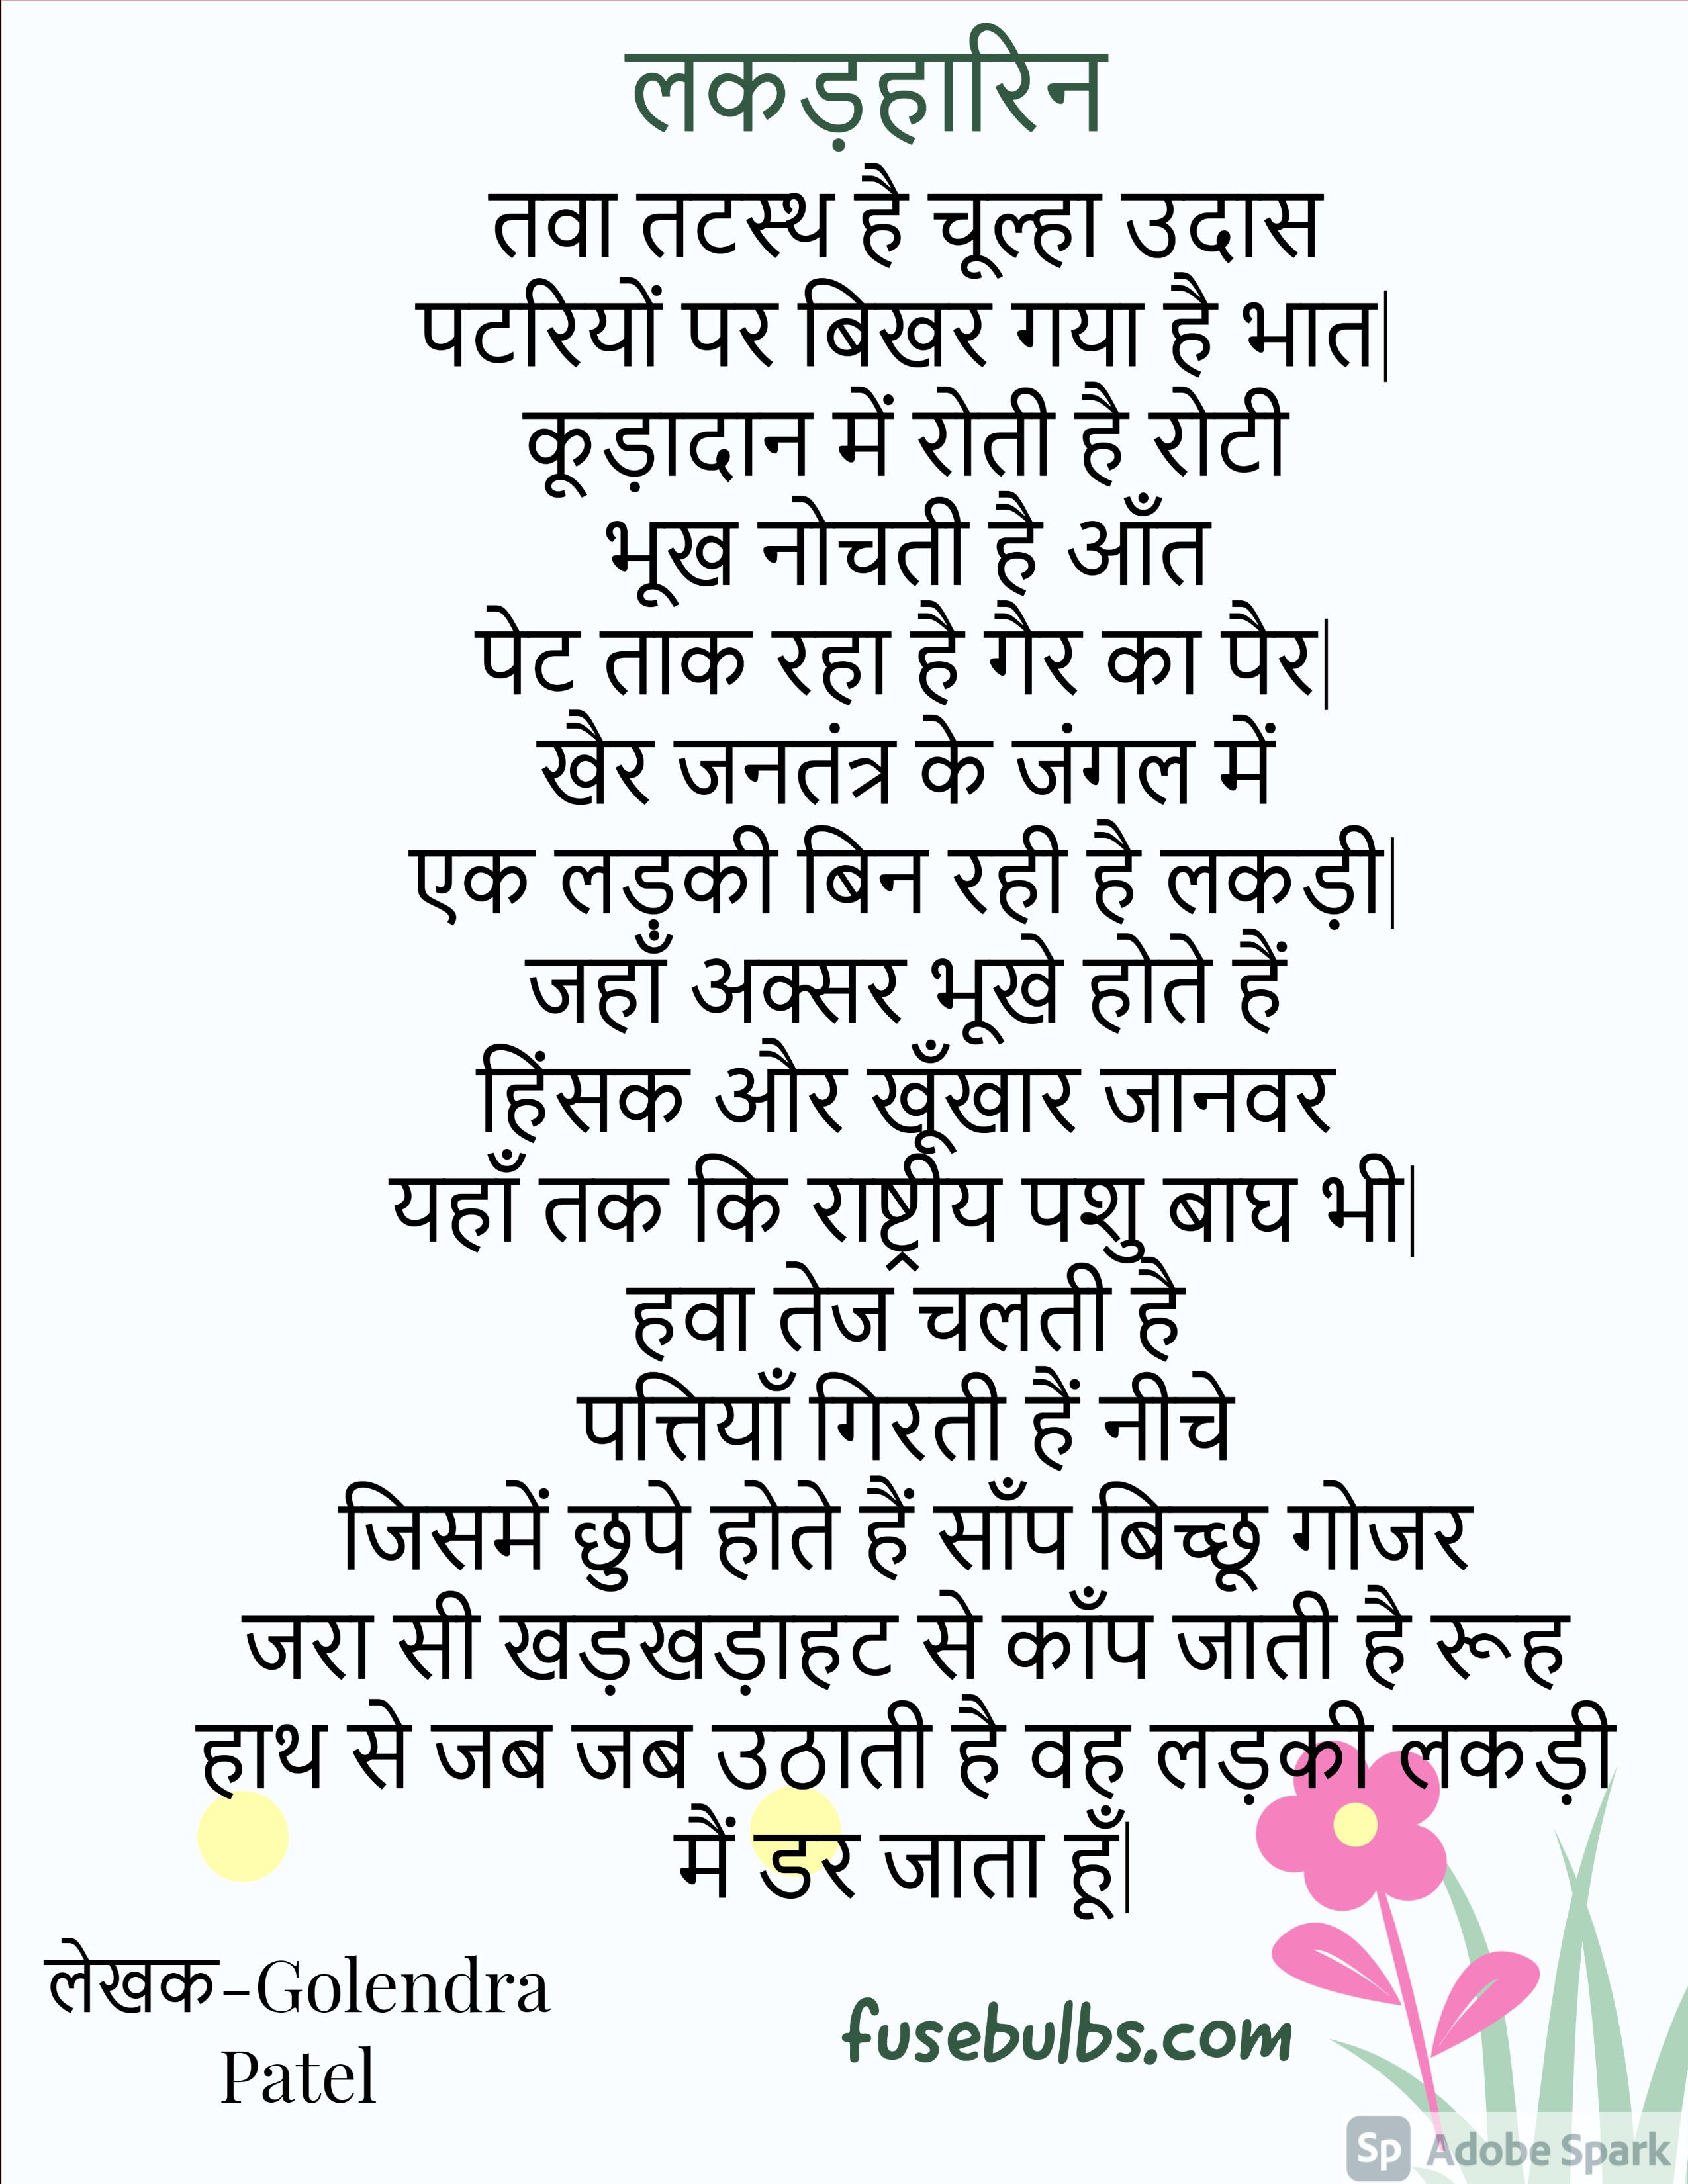 लकड़हारिन हिंदी कविता